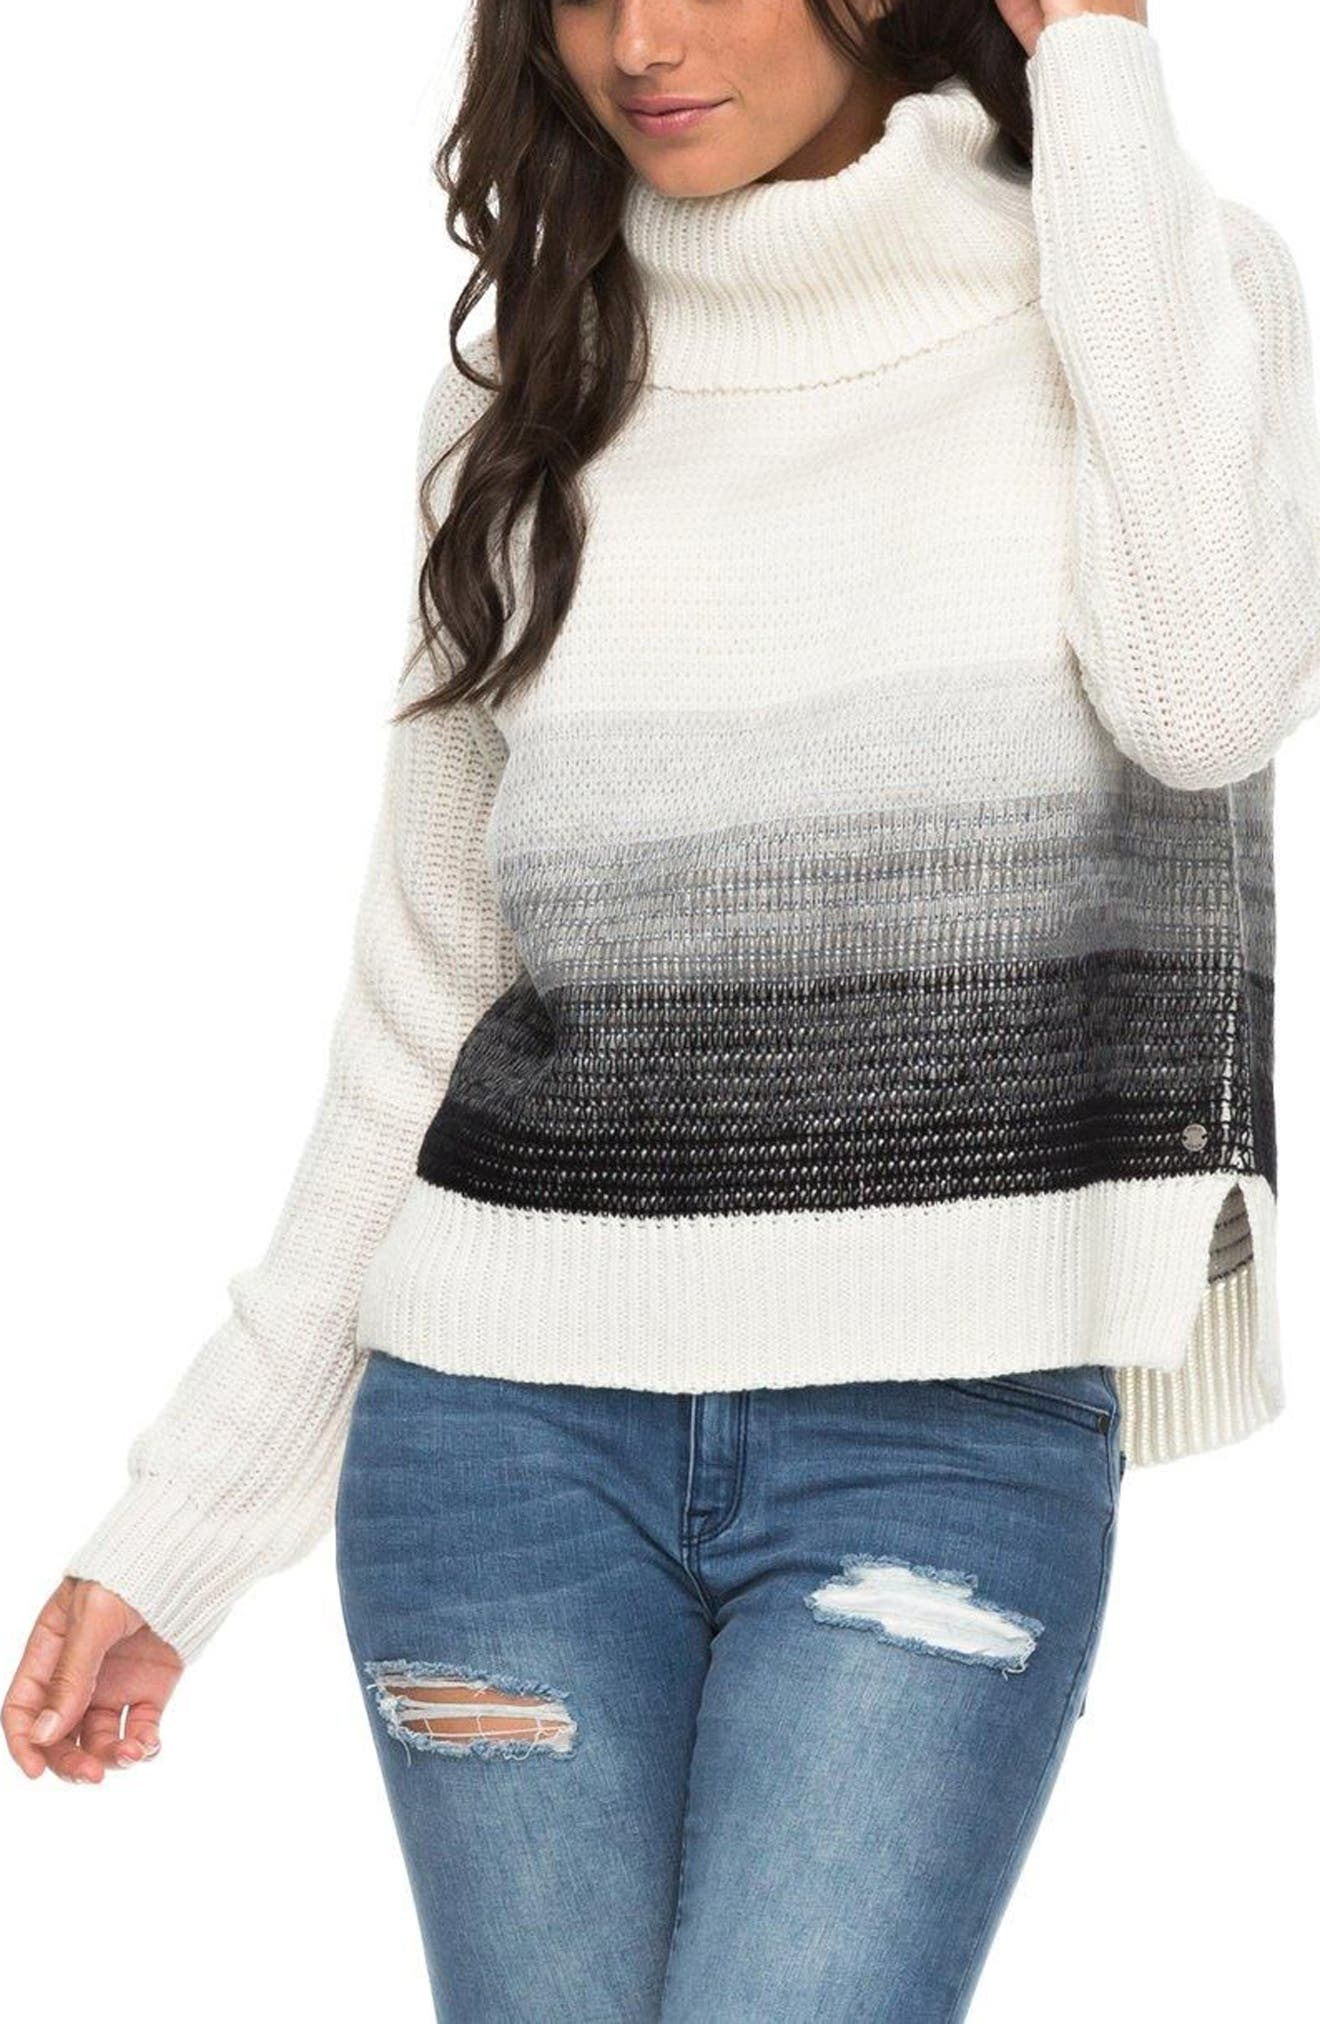 Morning Sun Sweater,                             Main thumbnail 1, color,                             101